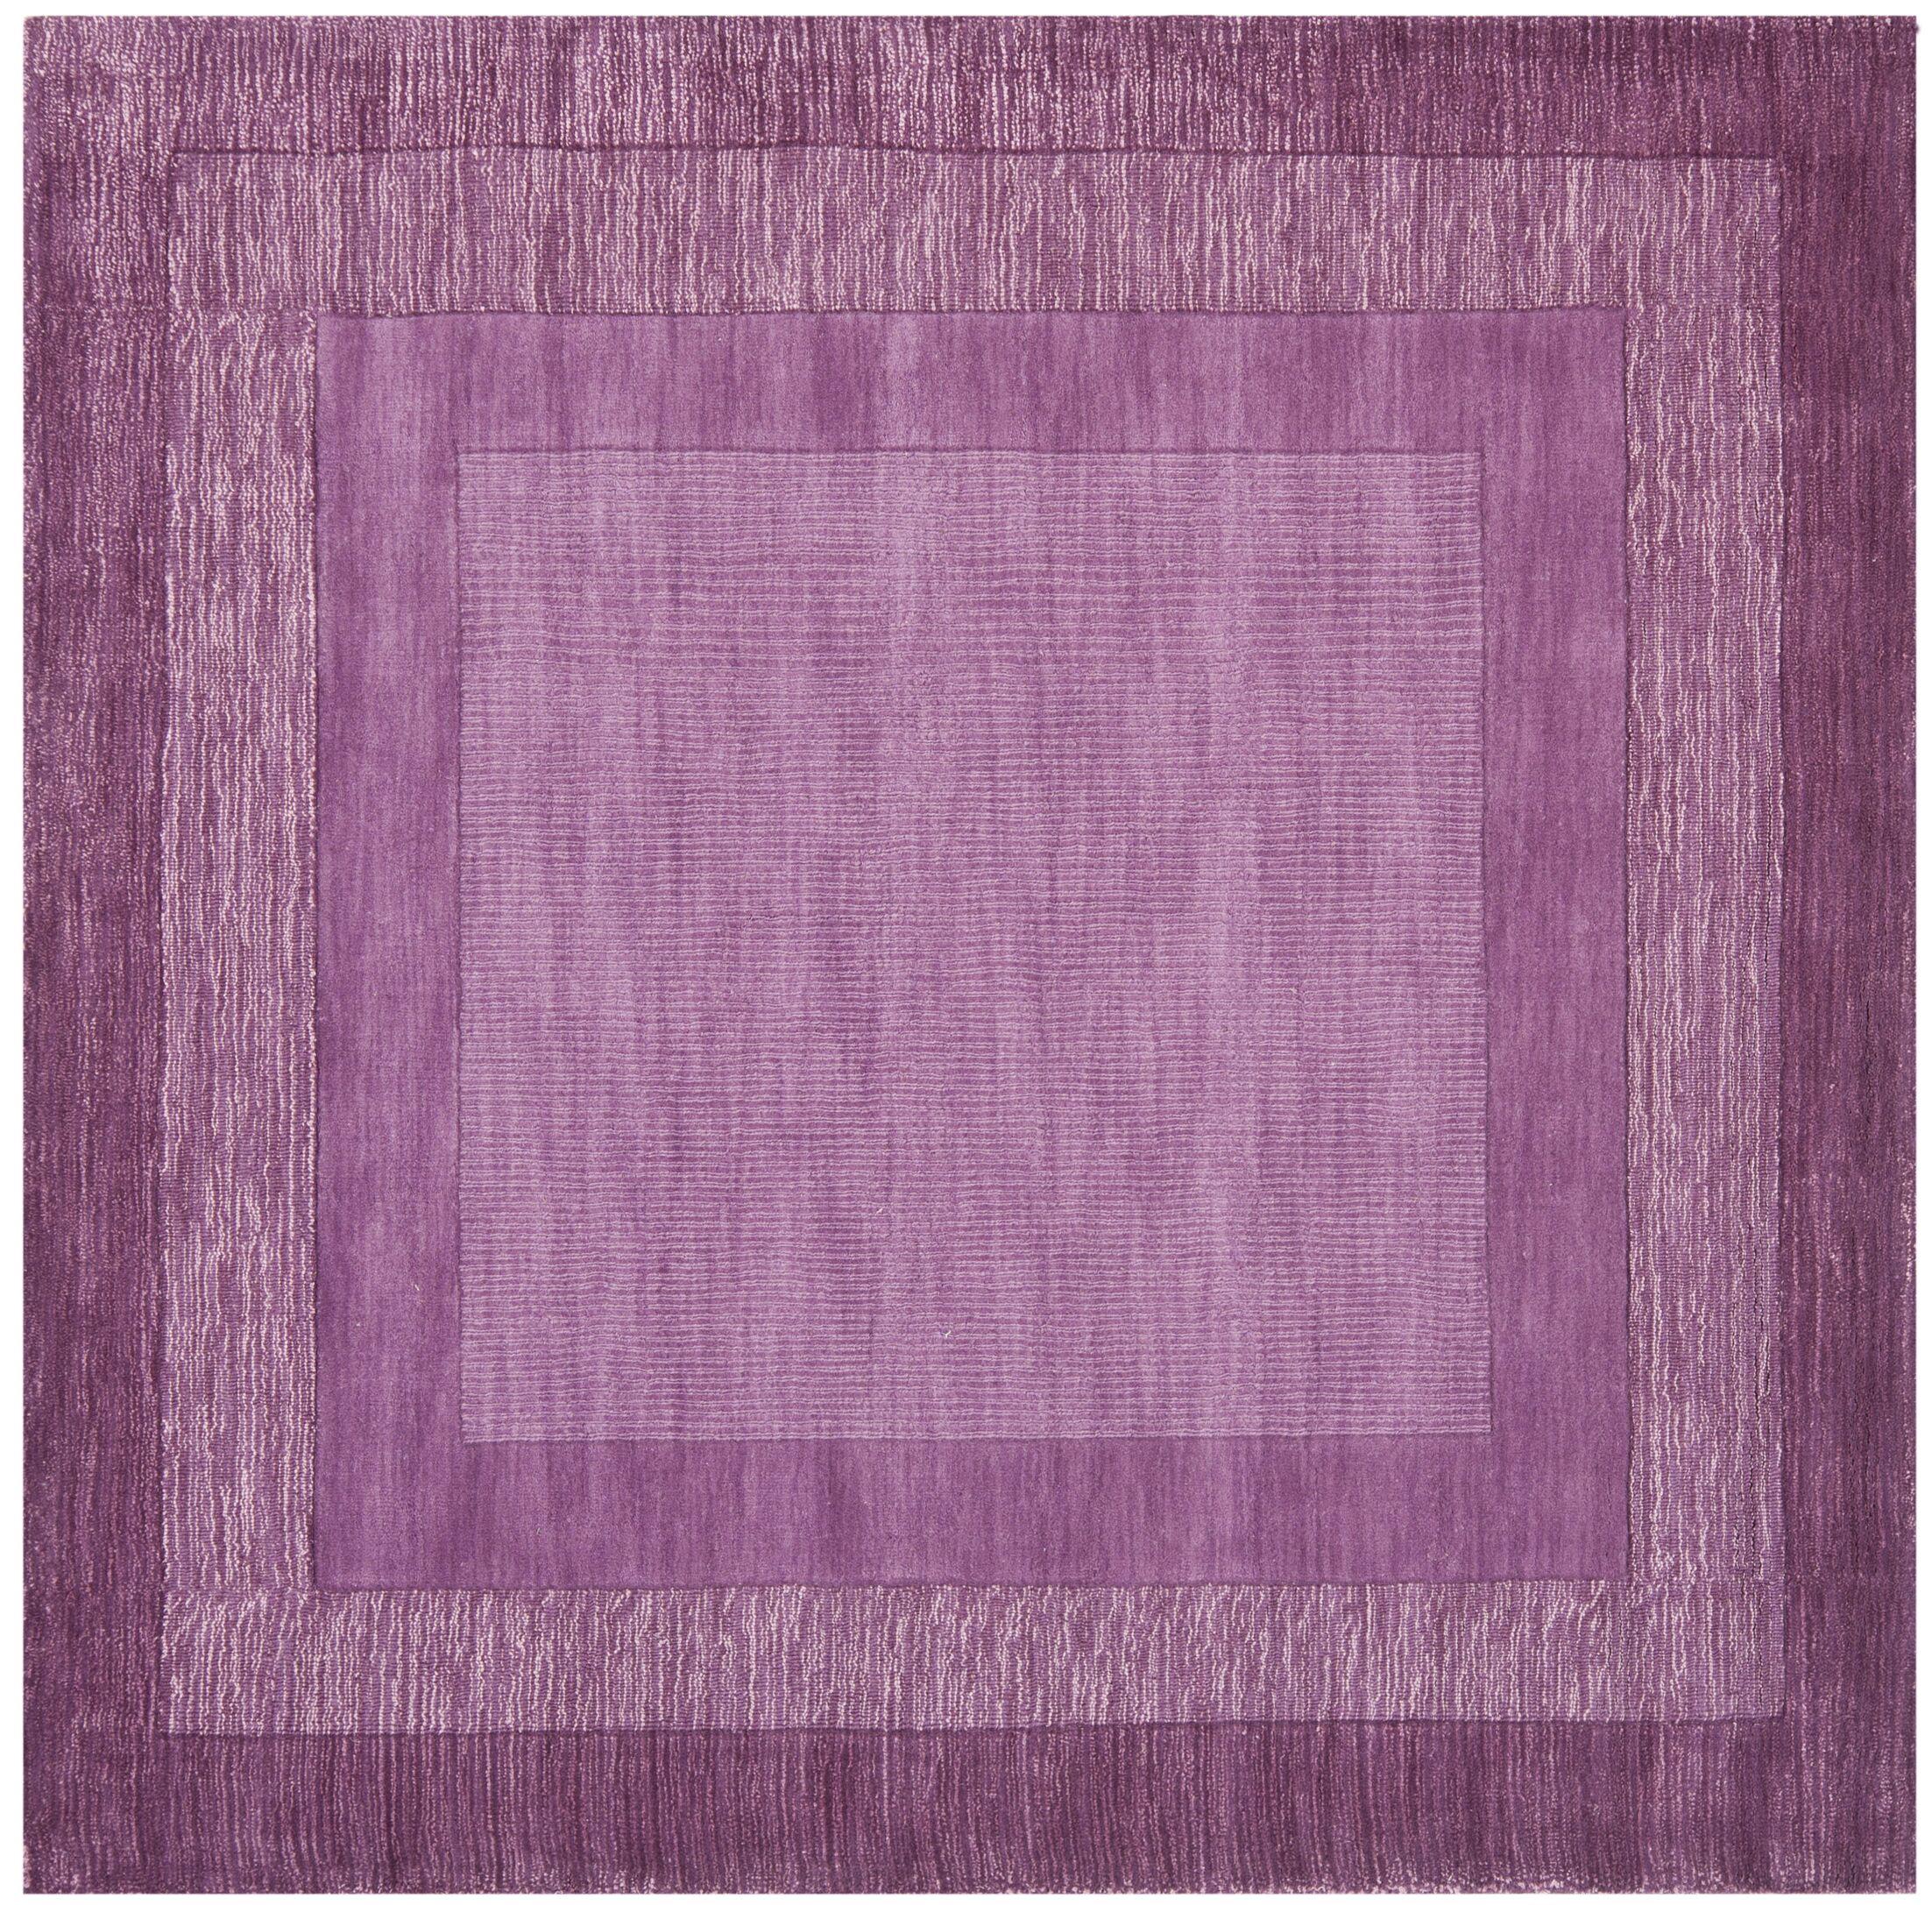 Scanlan Purple Area Rug Rug Size: Square 6'